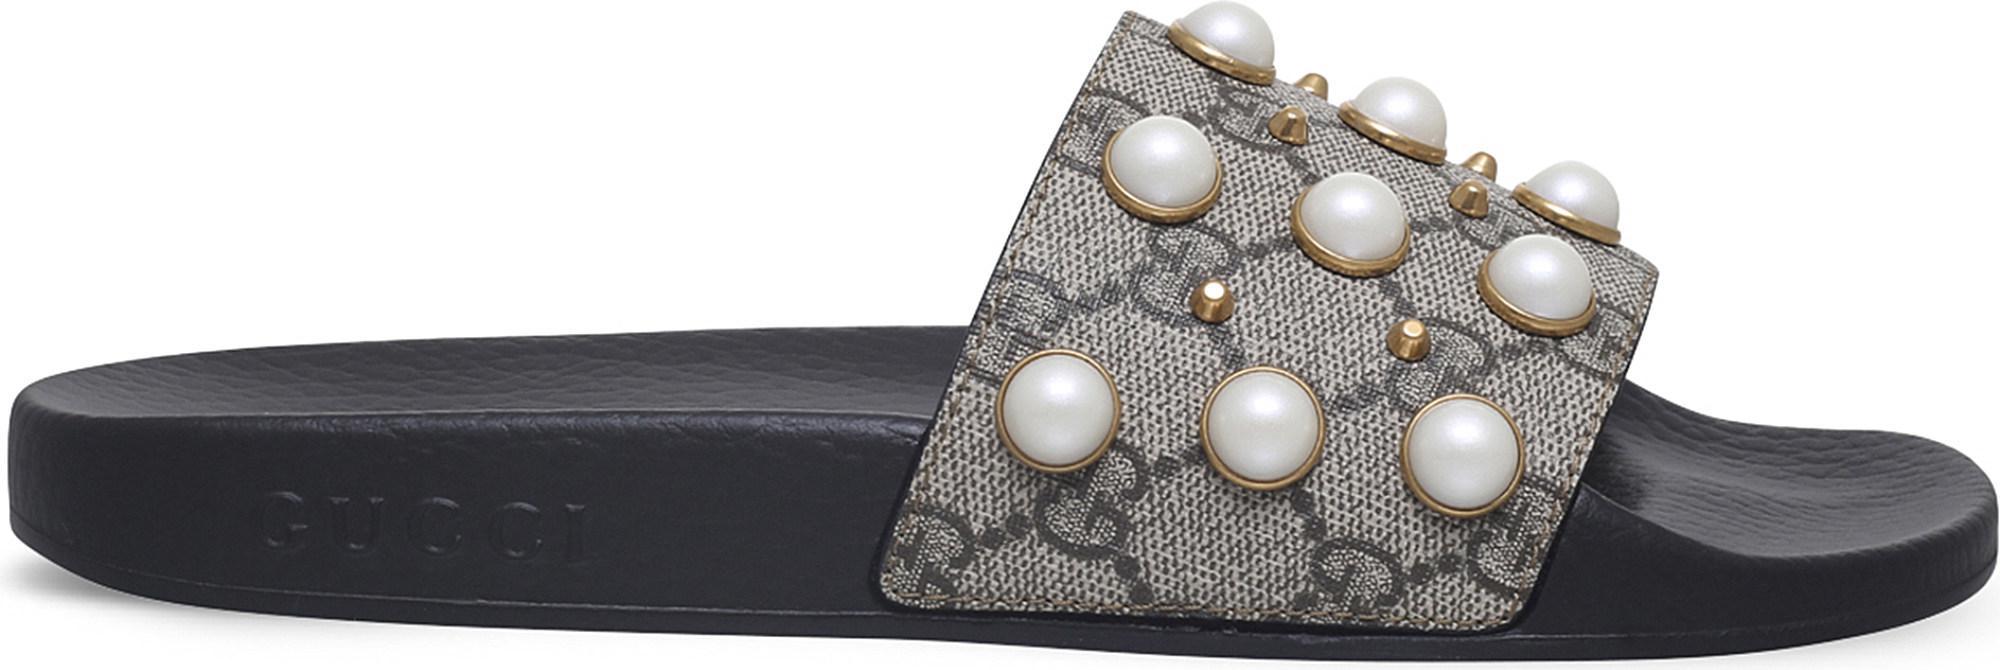 724c46cfa48 Gucci. Women s Pursuit Pearl-embellished Rubber Slider Sandals